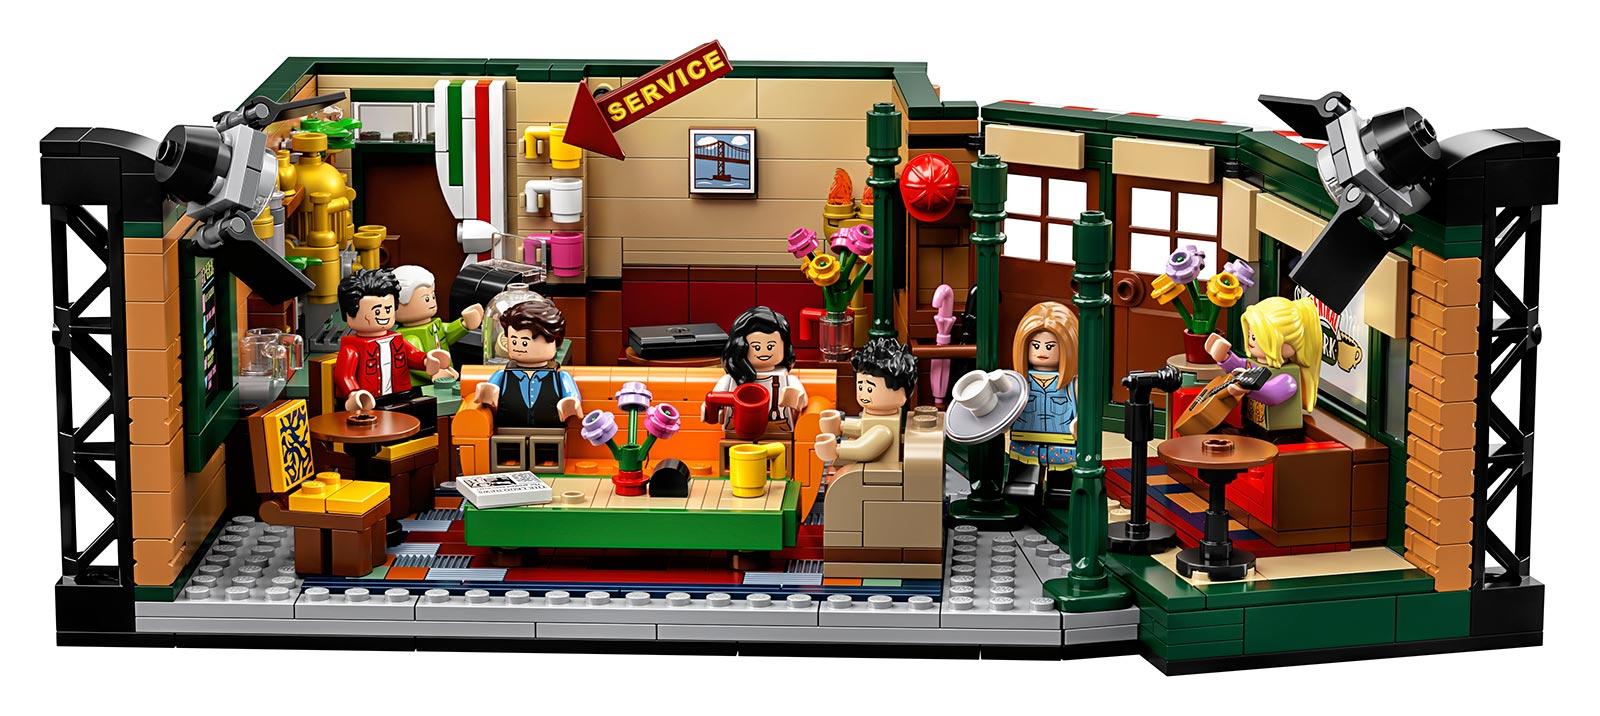 LEGO IDEAS Friends Central Perk Set 21319